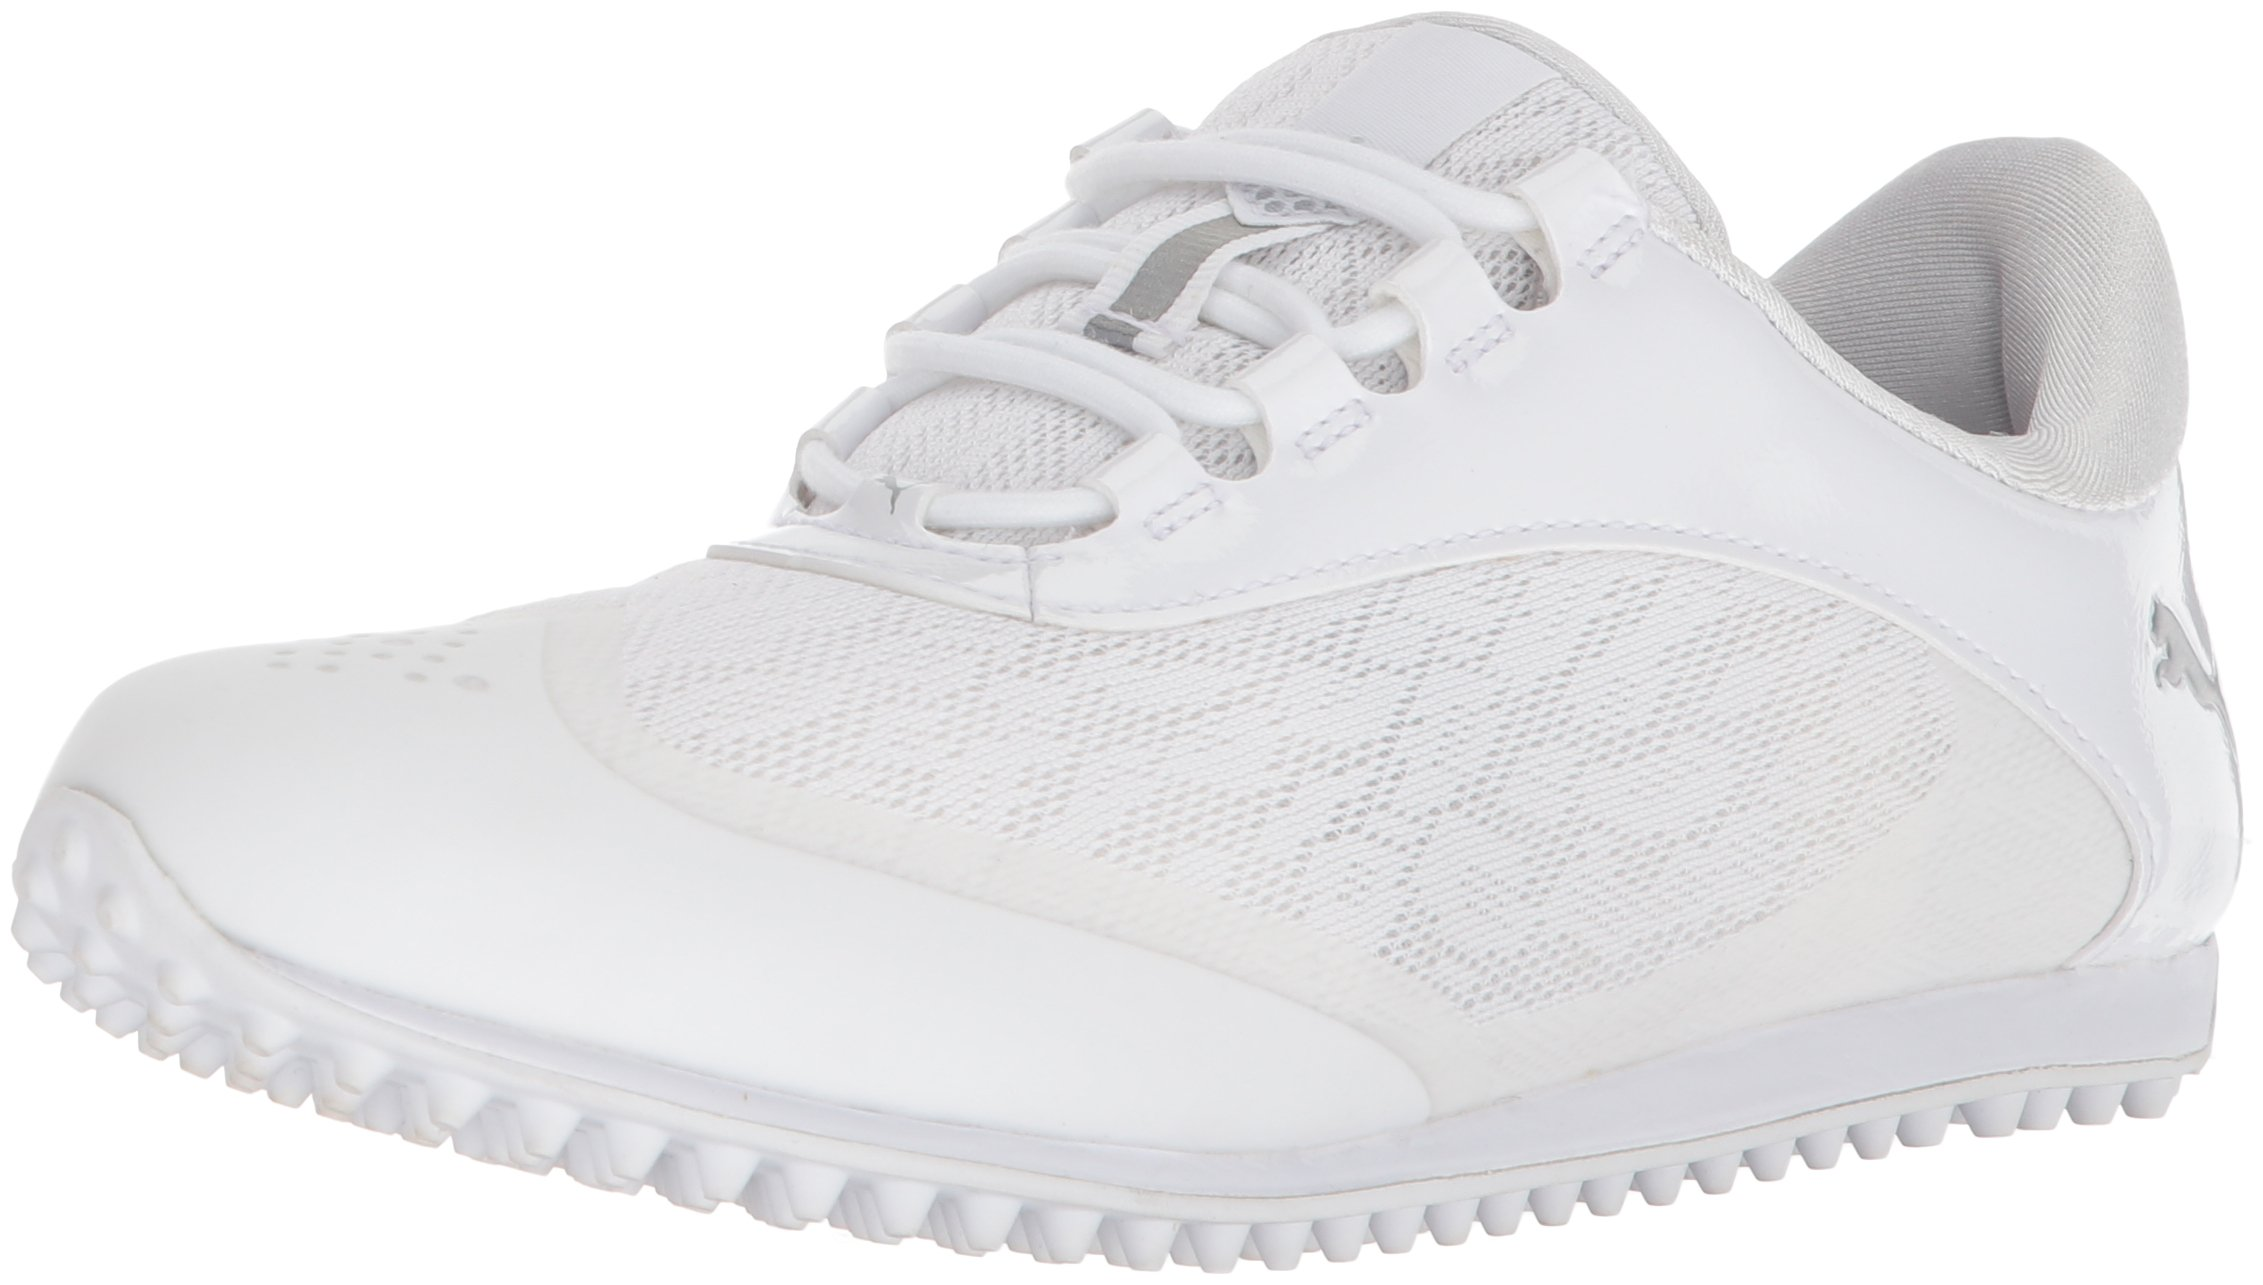 PUMA Golf Women's Summercat Sport Golf Shoe, White/Silver/High Rise, 9.5 Medium US